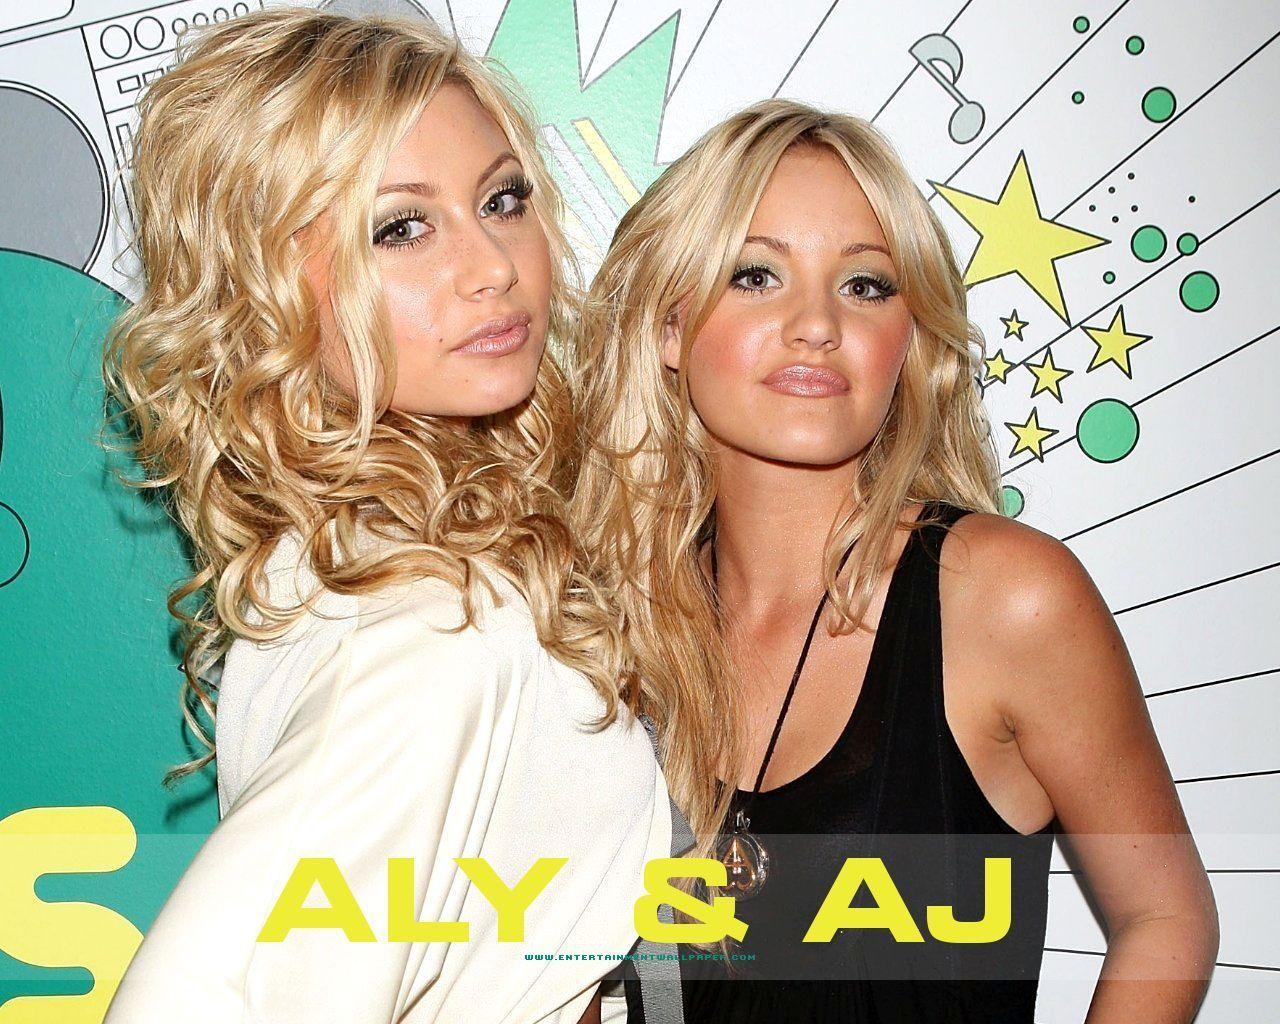 aly and aj michalka - photo #25